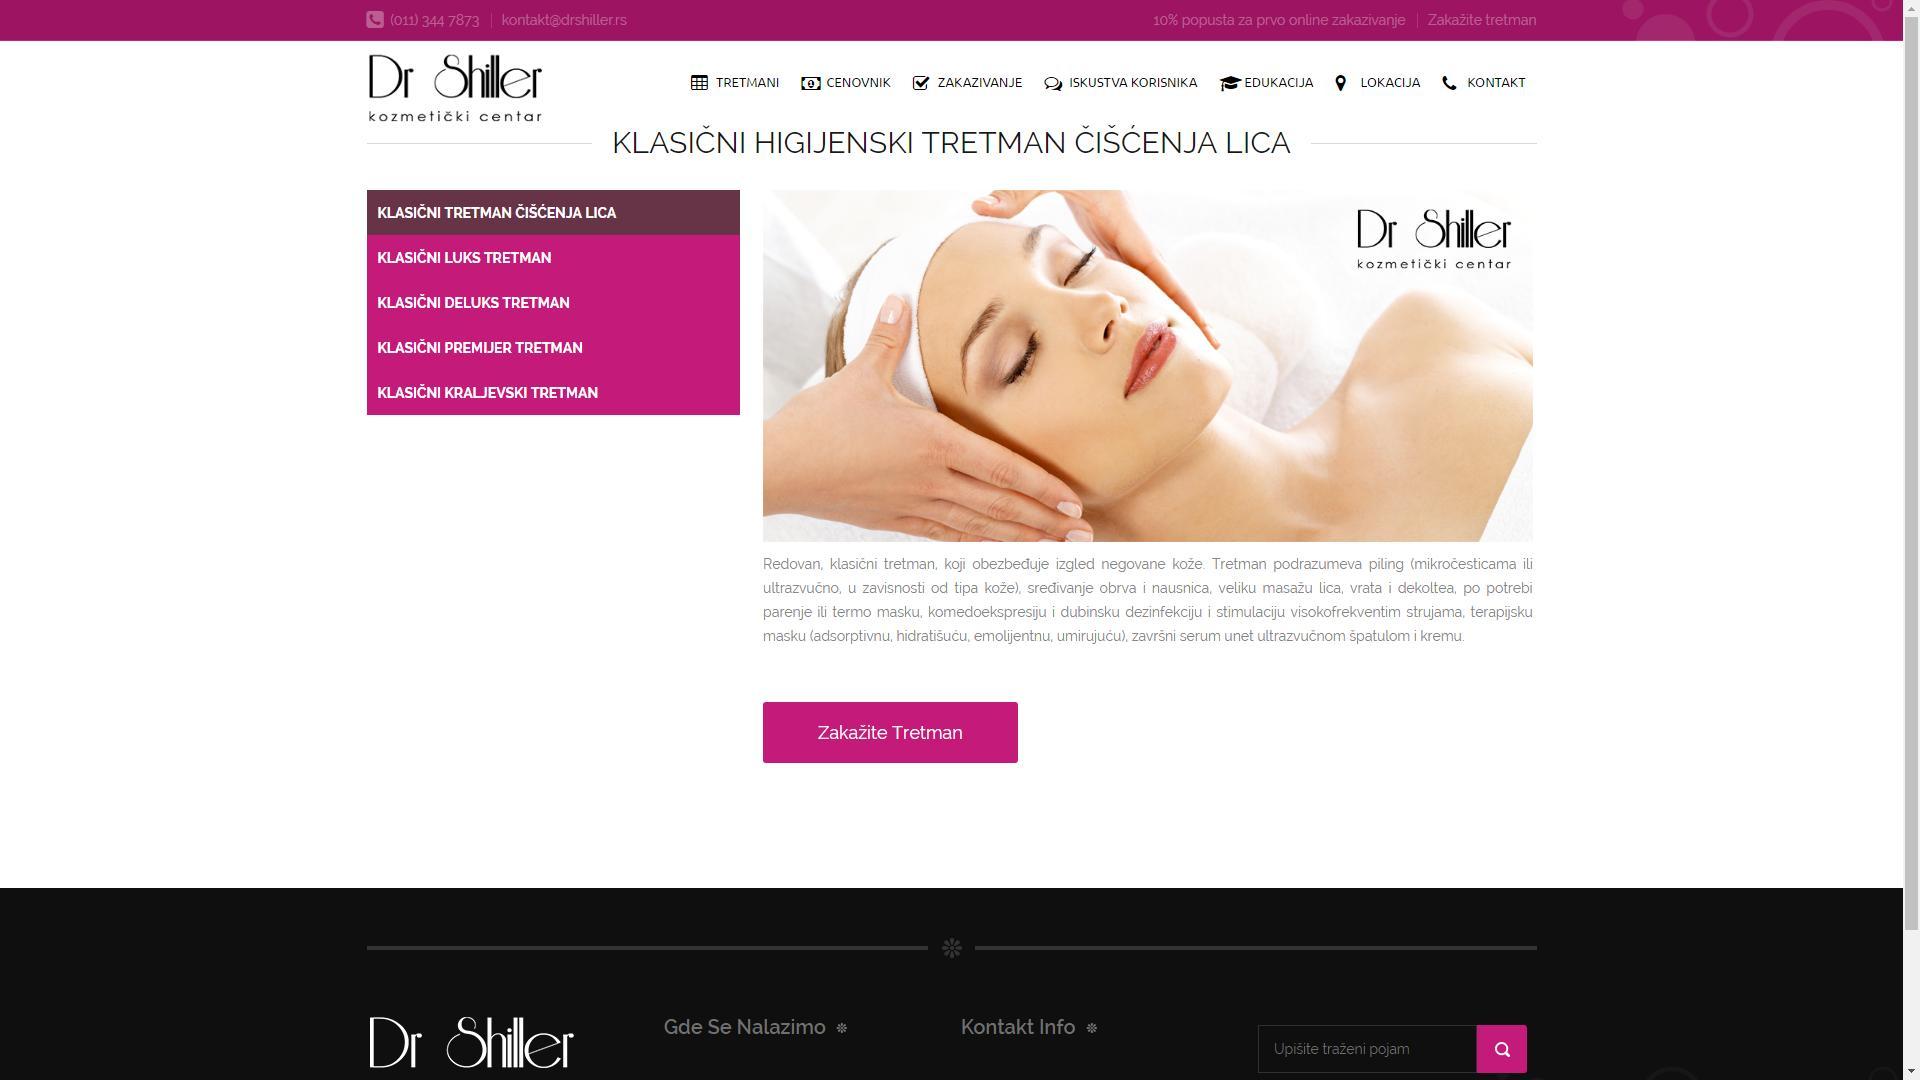 drshiller-kozmeticki-salon-ss3